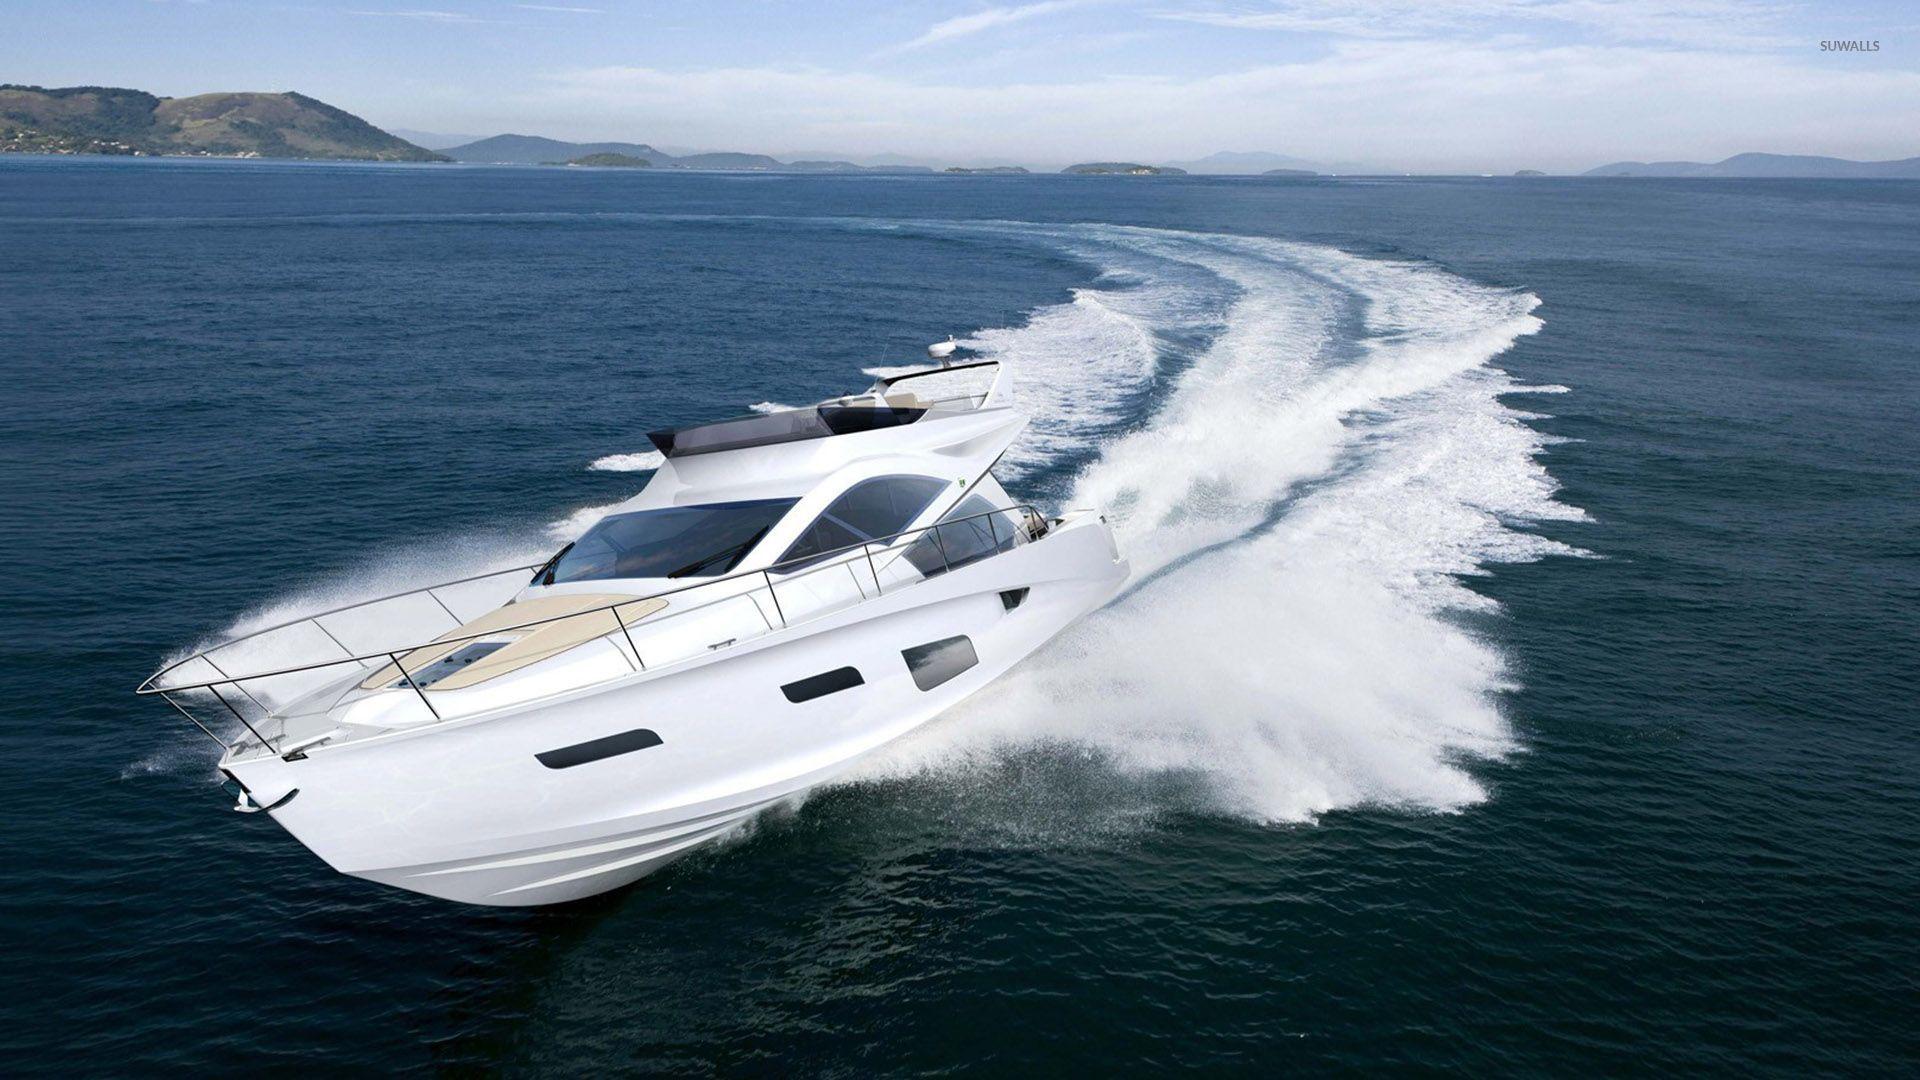 Intermarine 55 Luxury Yacht Wallpaper Photography Wallpapers 29196